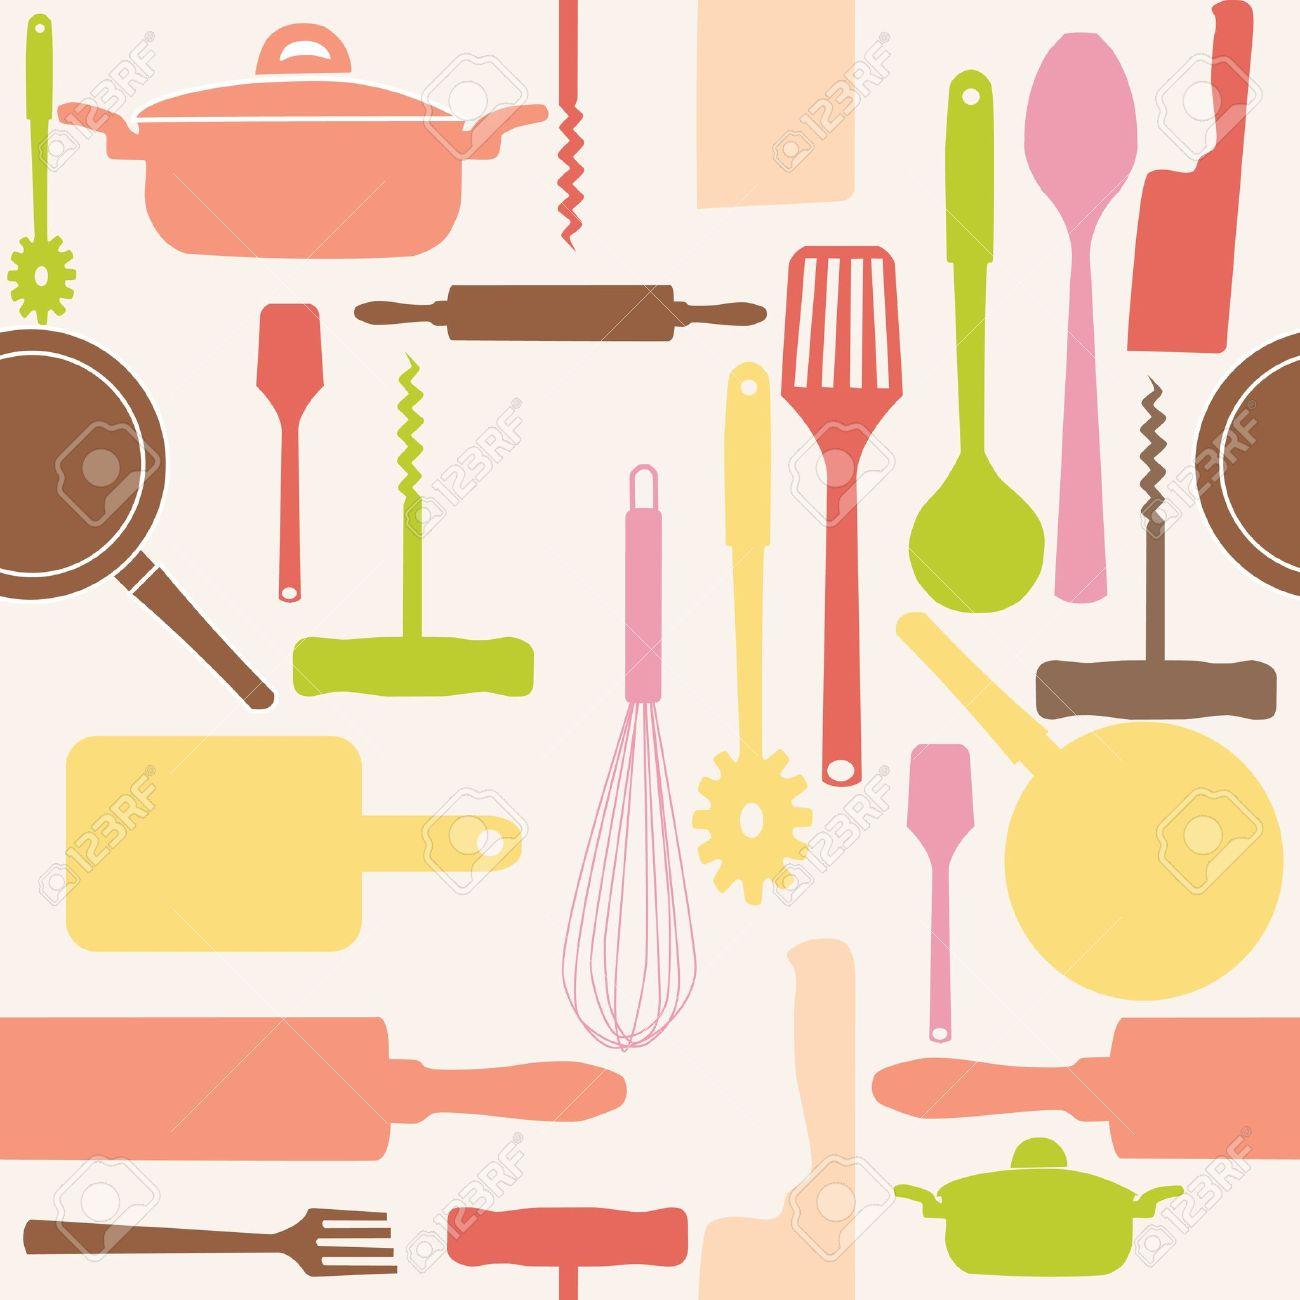 Kitchen Utensils Clipart